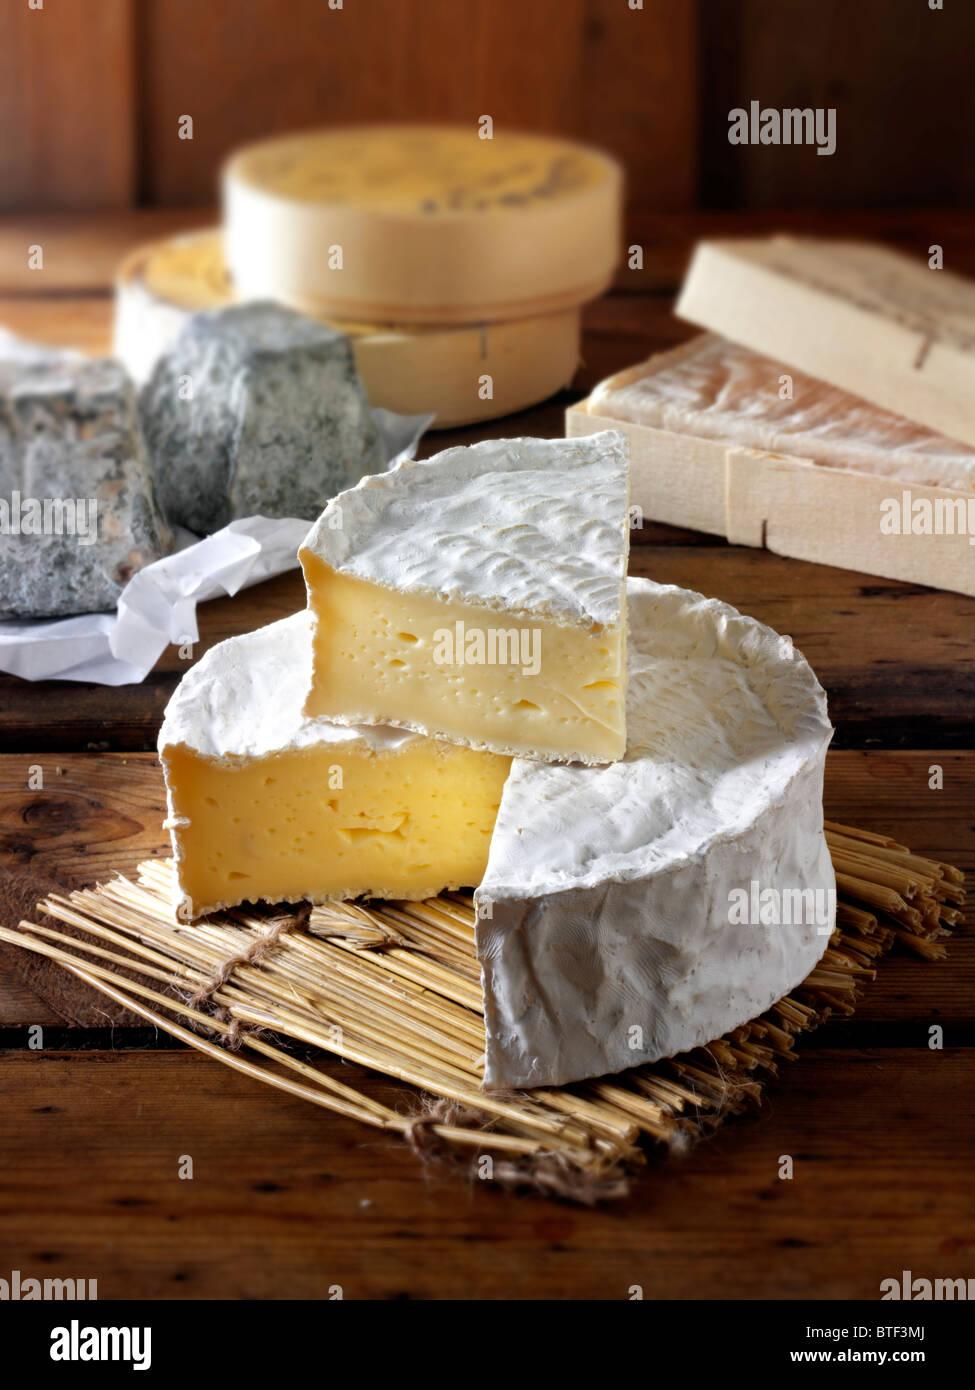 Coulommier tradicional queso francés Imagen De Stock